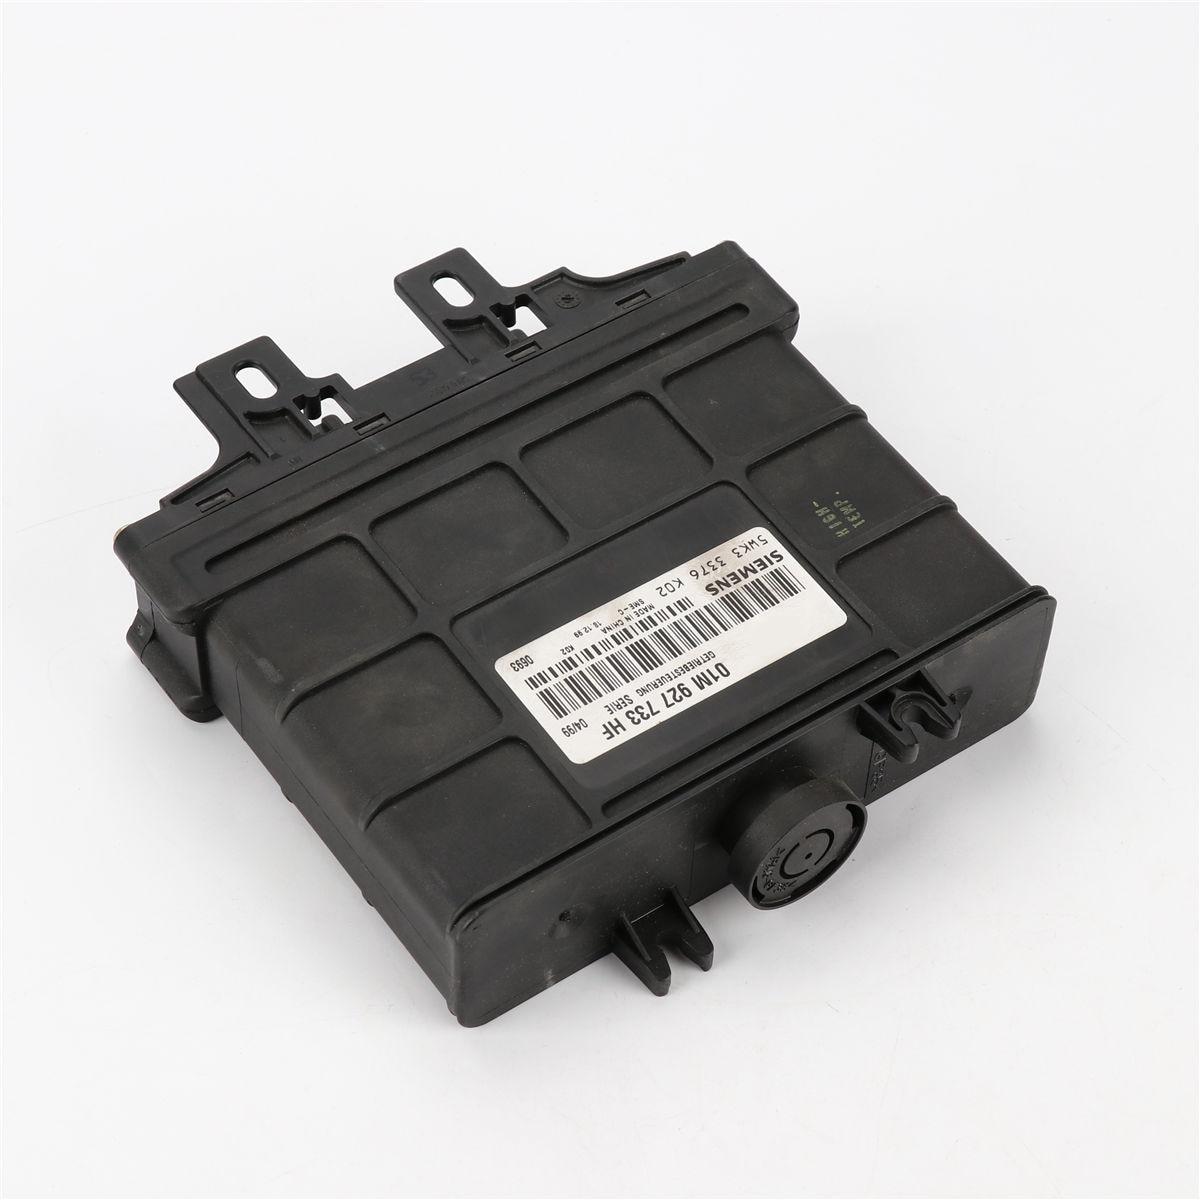 1pc New Automatic Gearbox Control Unit for VW Bora Golf AUDI A3 Octavia 01M 927 733 HF 01m 01p auto transmission pump fit for audi vw 01m 095 096 01p 098 ag4 4 sp fwd refurbishment